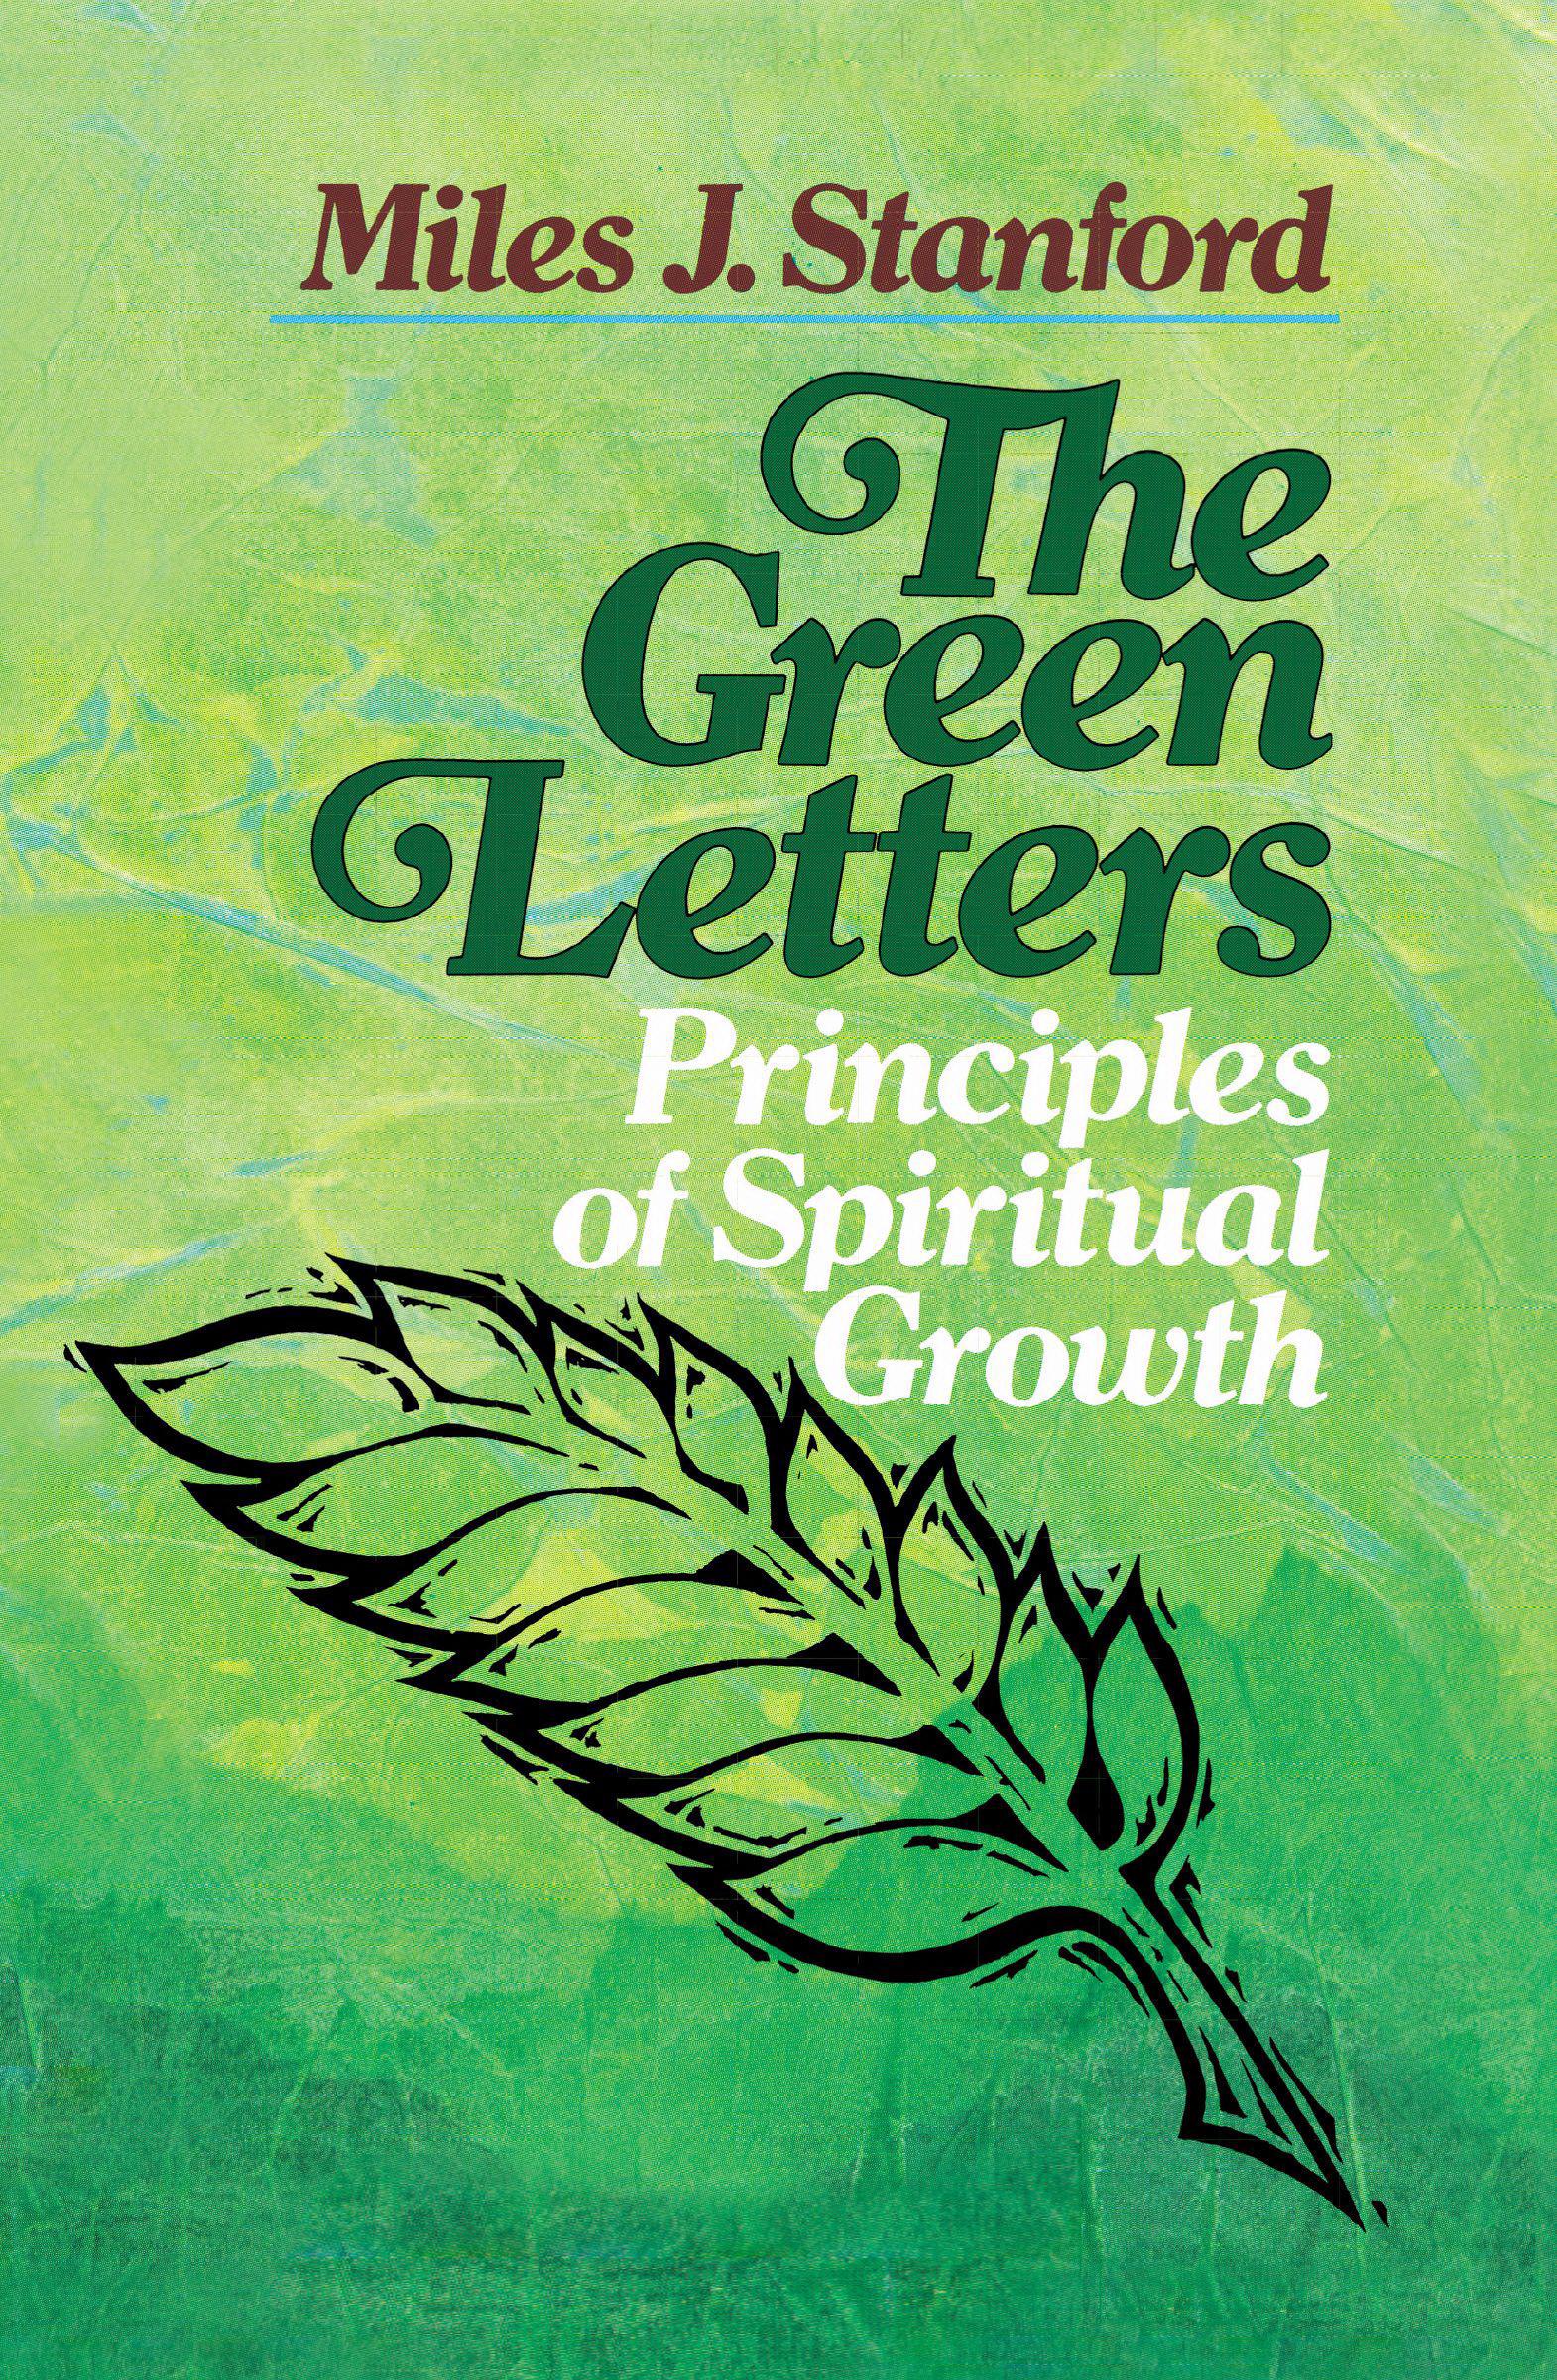 principles of spiritual growth pdf